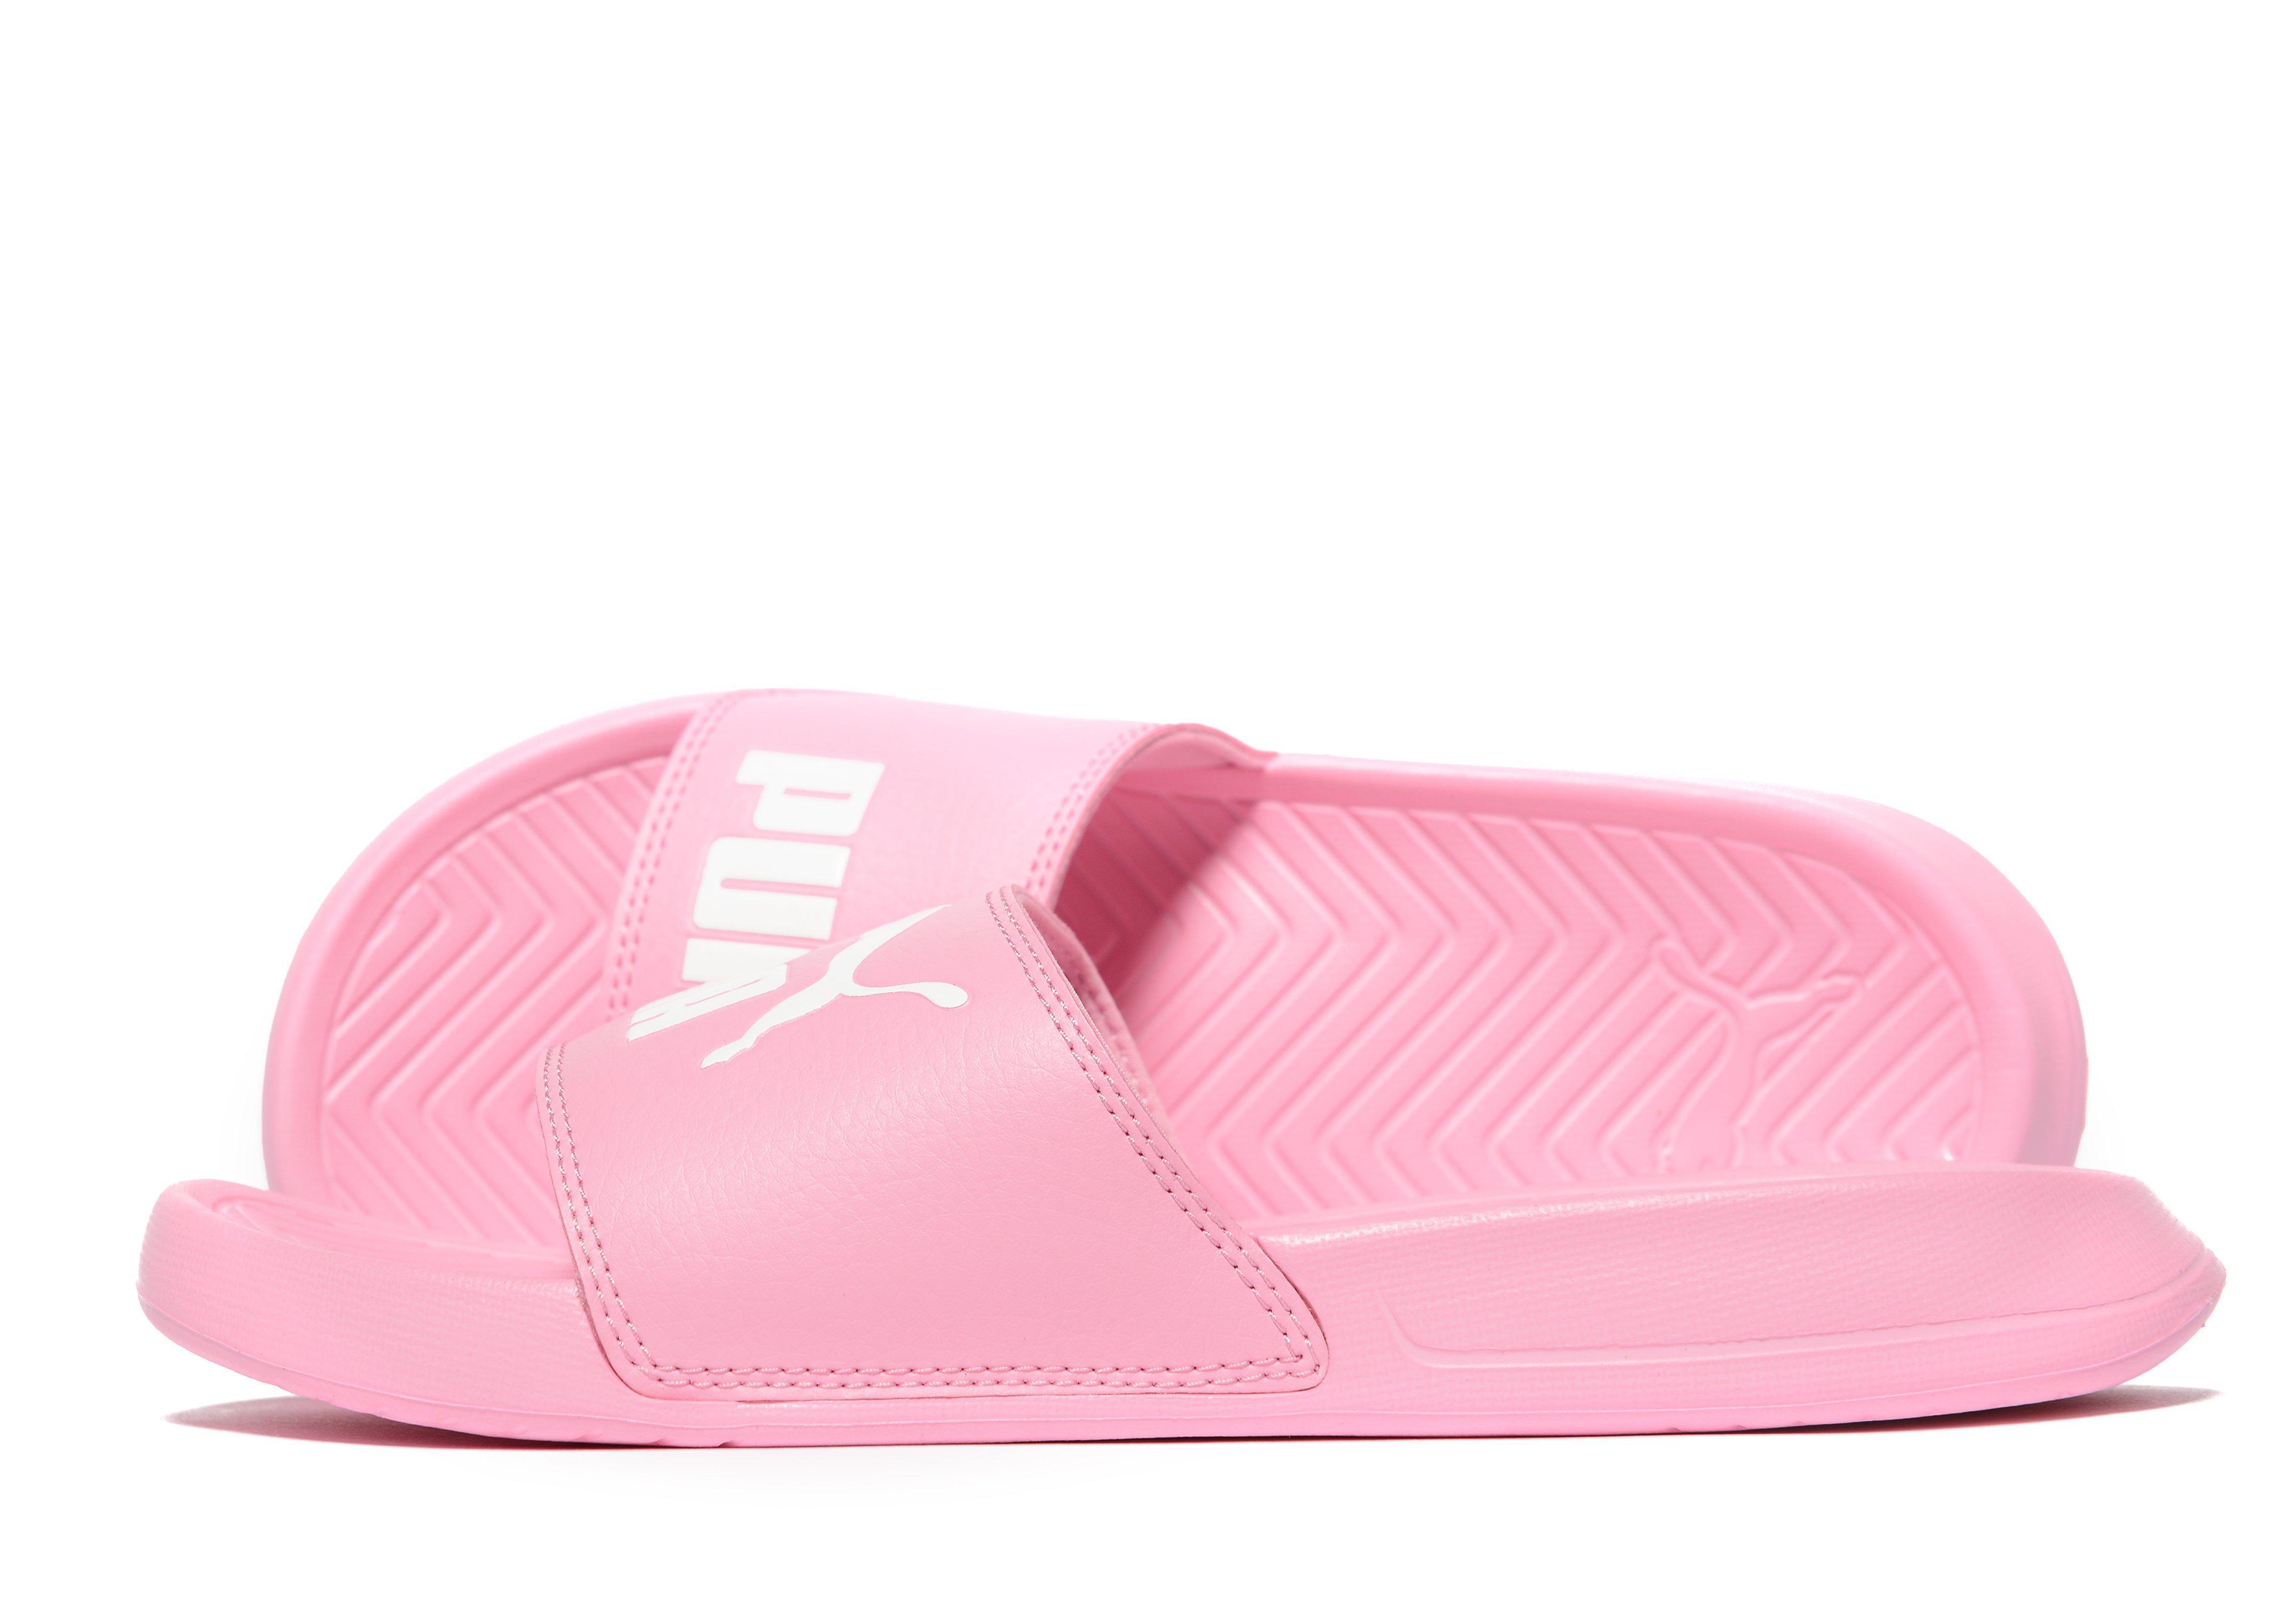 78dcec963a76 PUMA Popcat Slides in Pink - Lyst